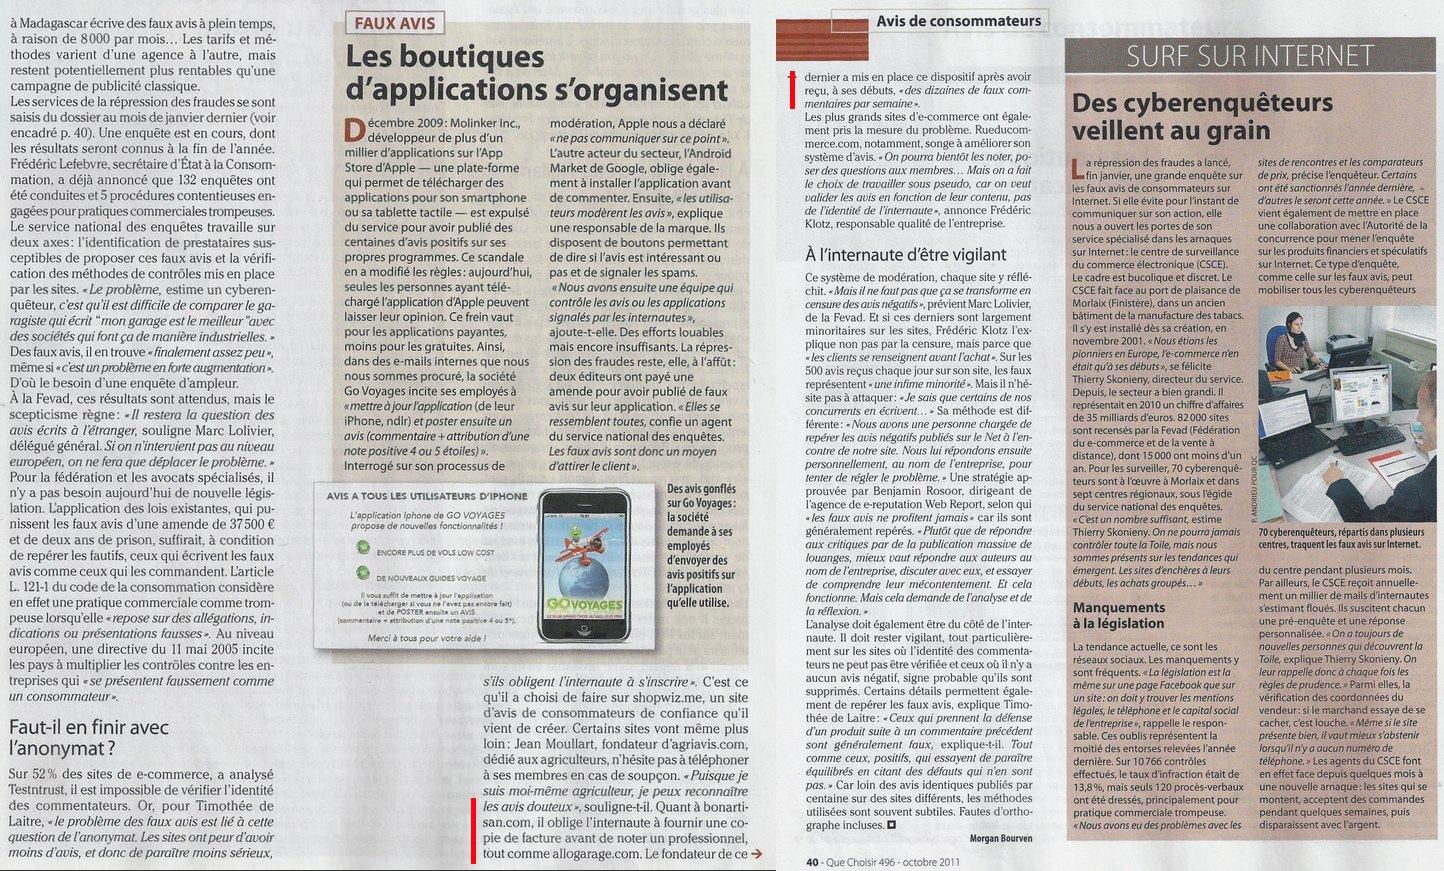 article_que_choisir_octobre_2011.jpg